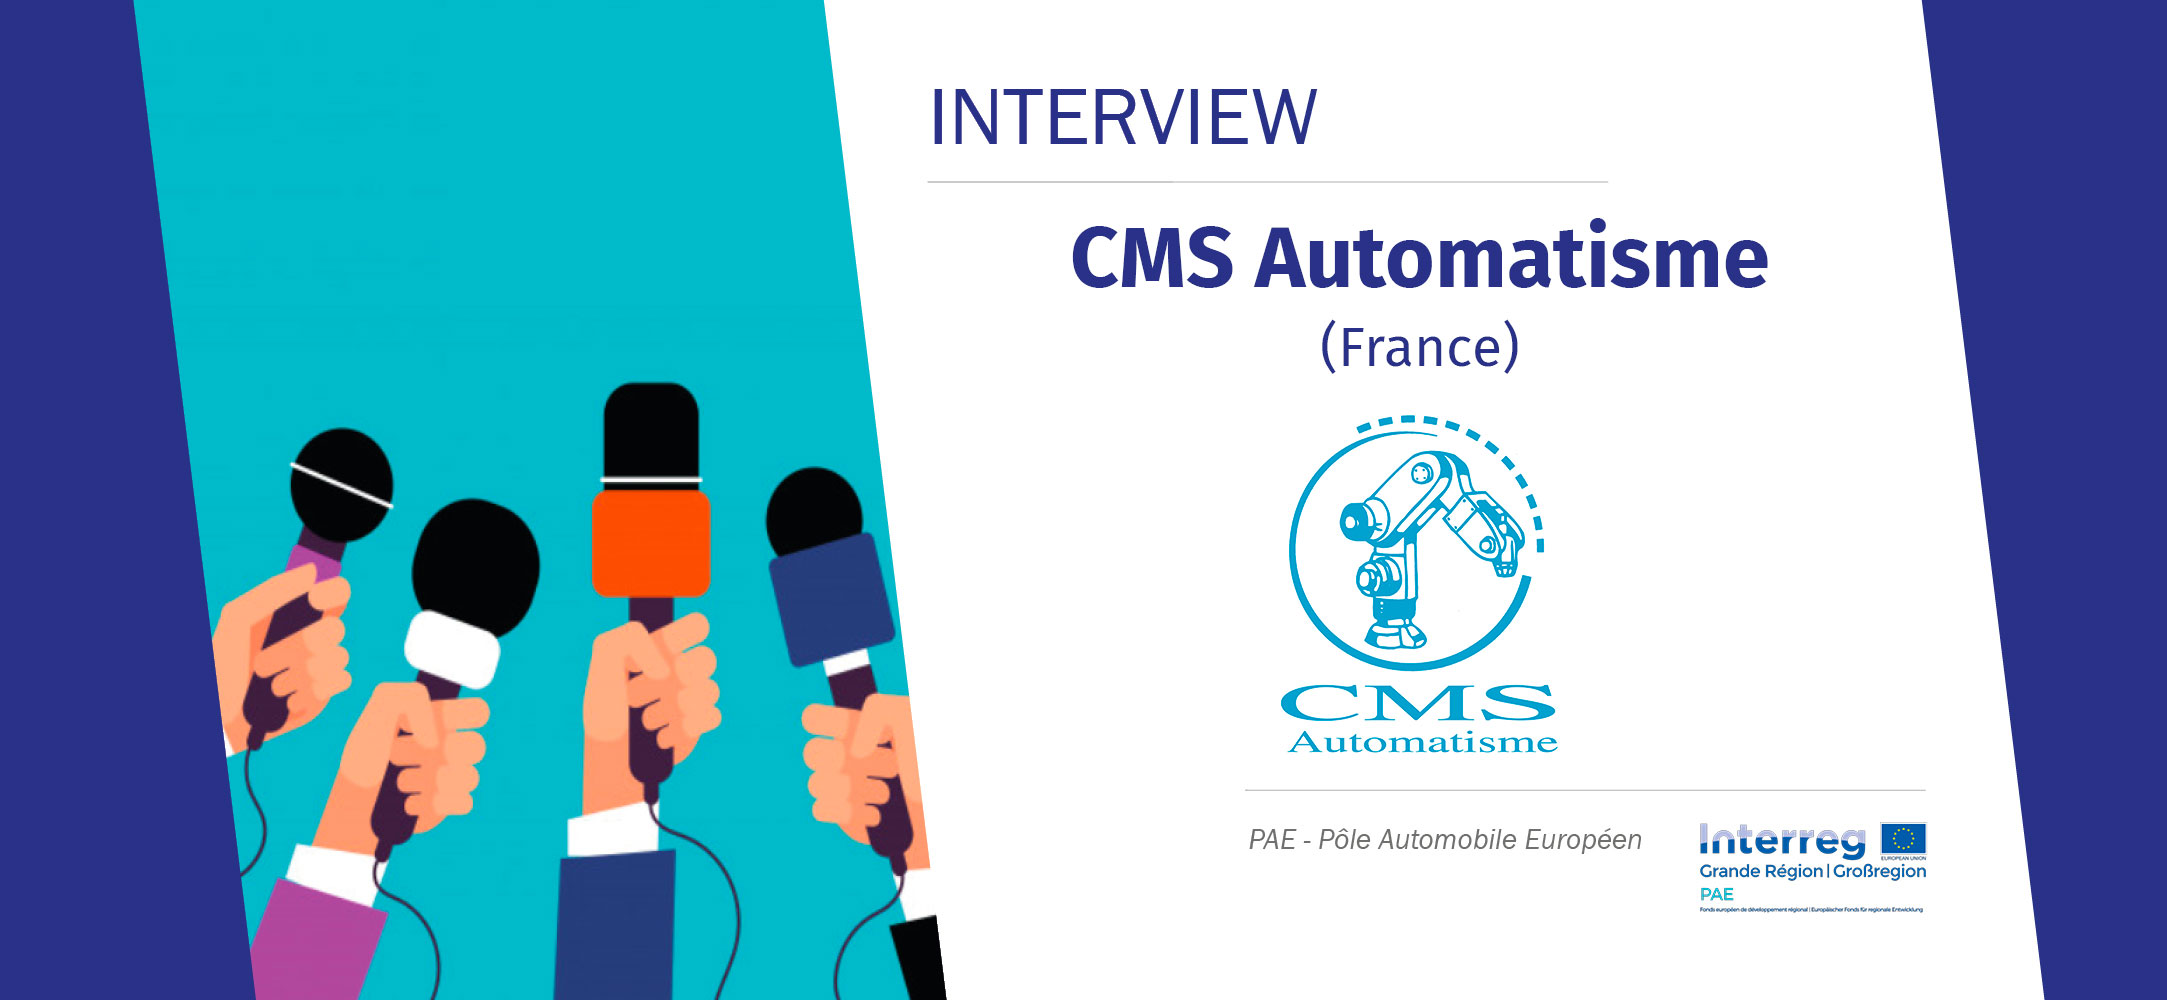 CMS Automatisme Unternehmensinterviews